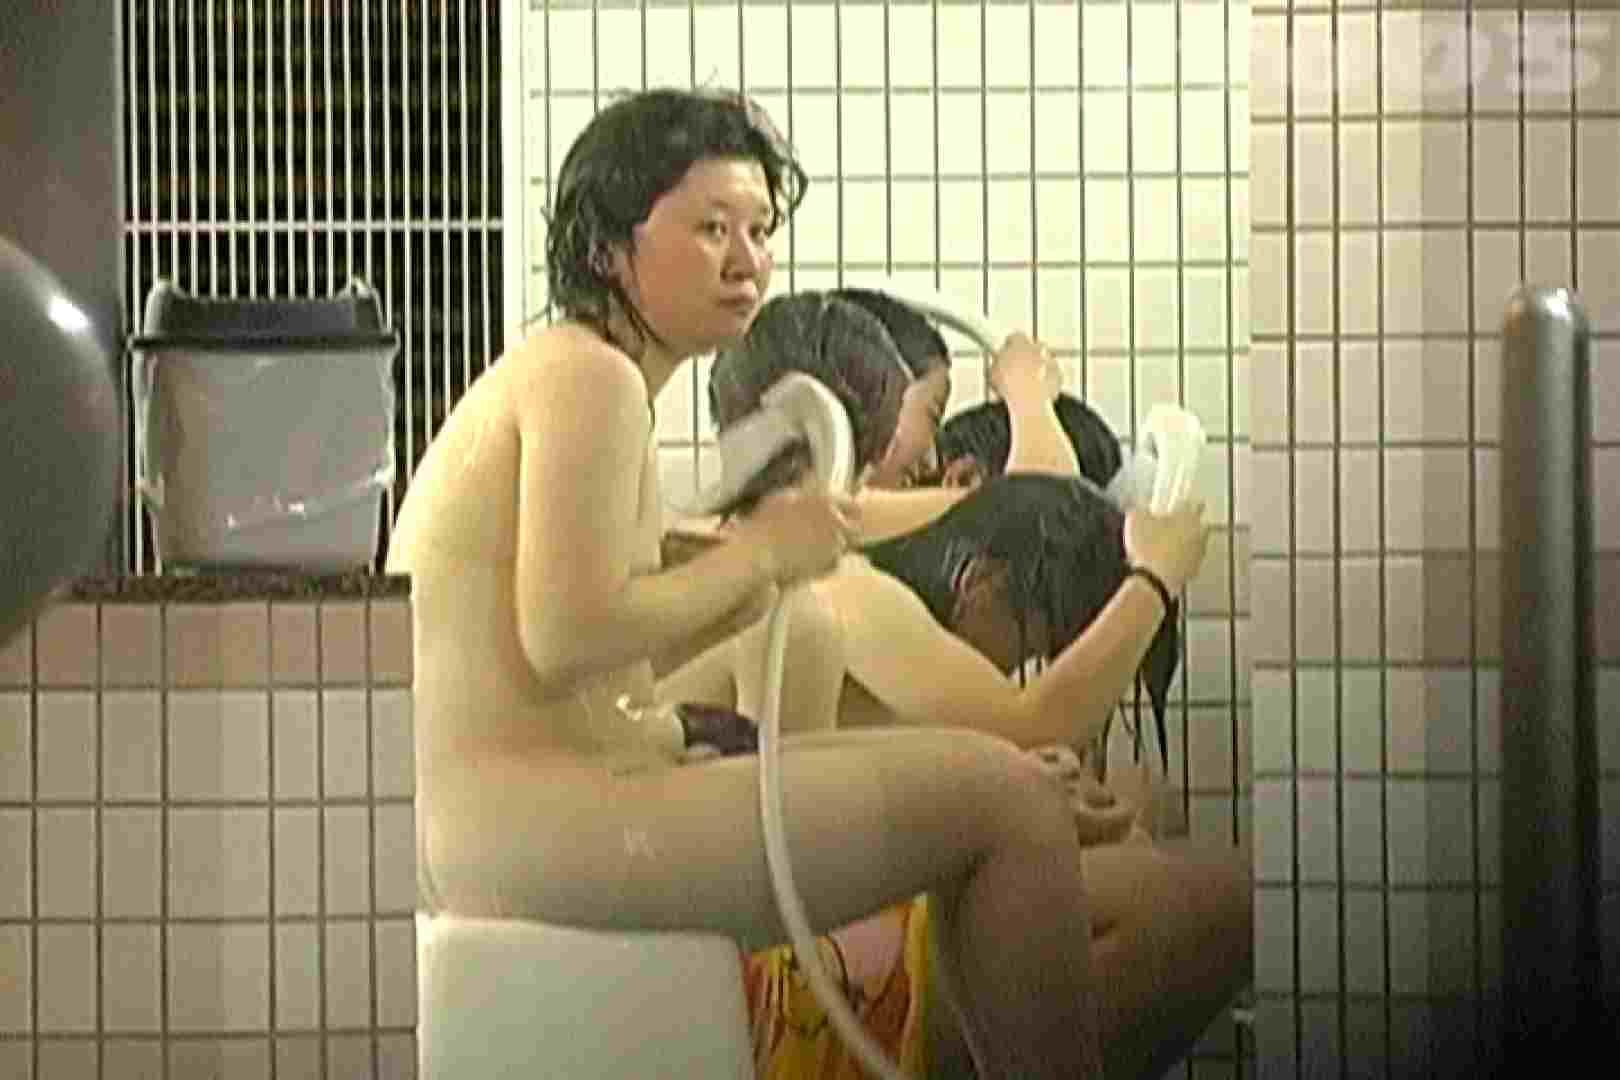 ▲復活限定▲合宿ホテル女風呂盗撮 Vol.27 女風呂  87pic 30